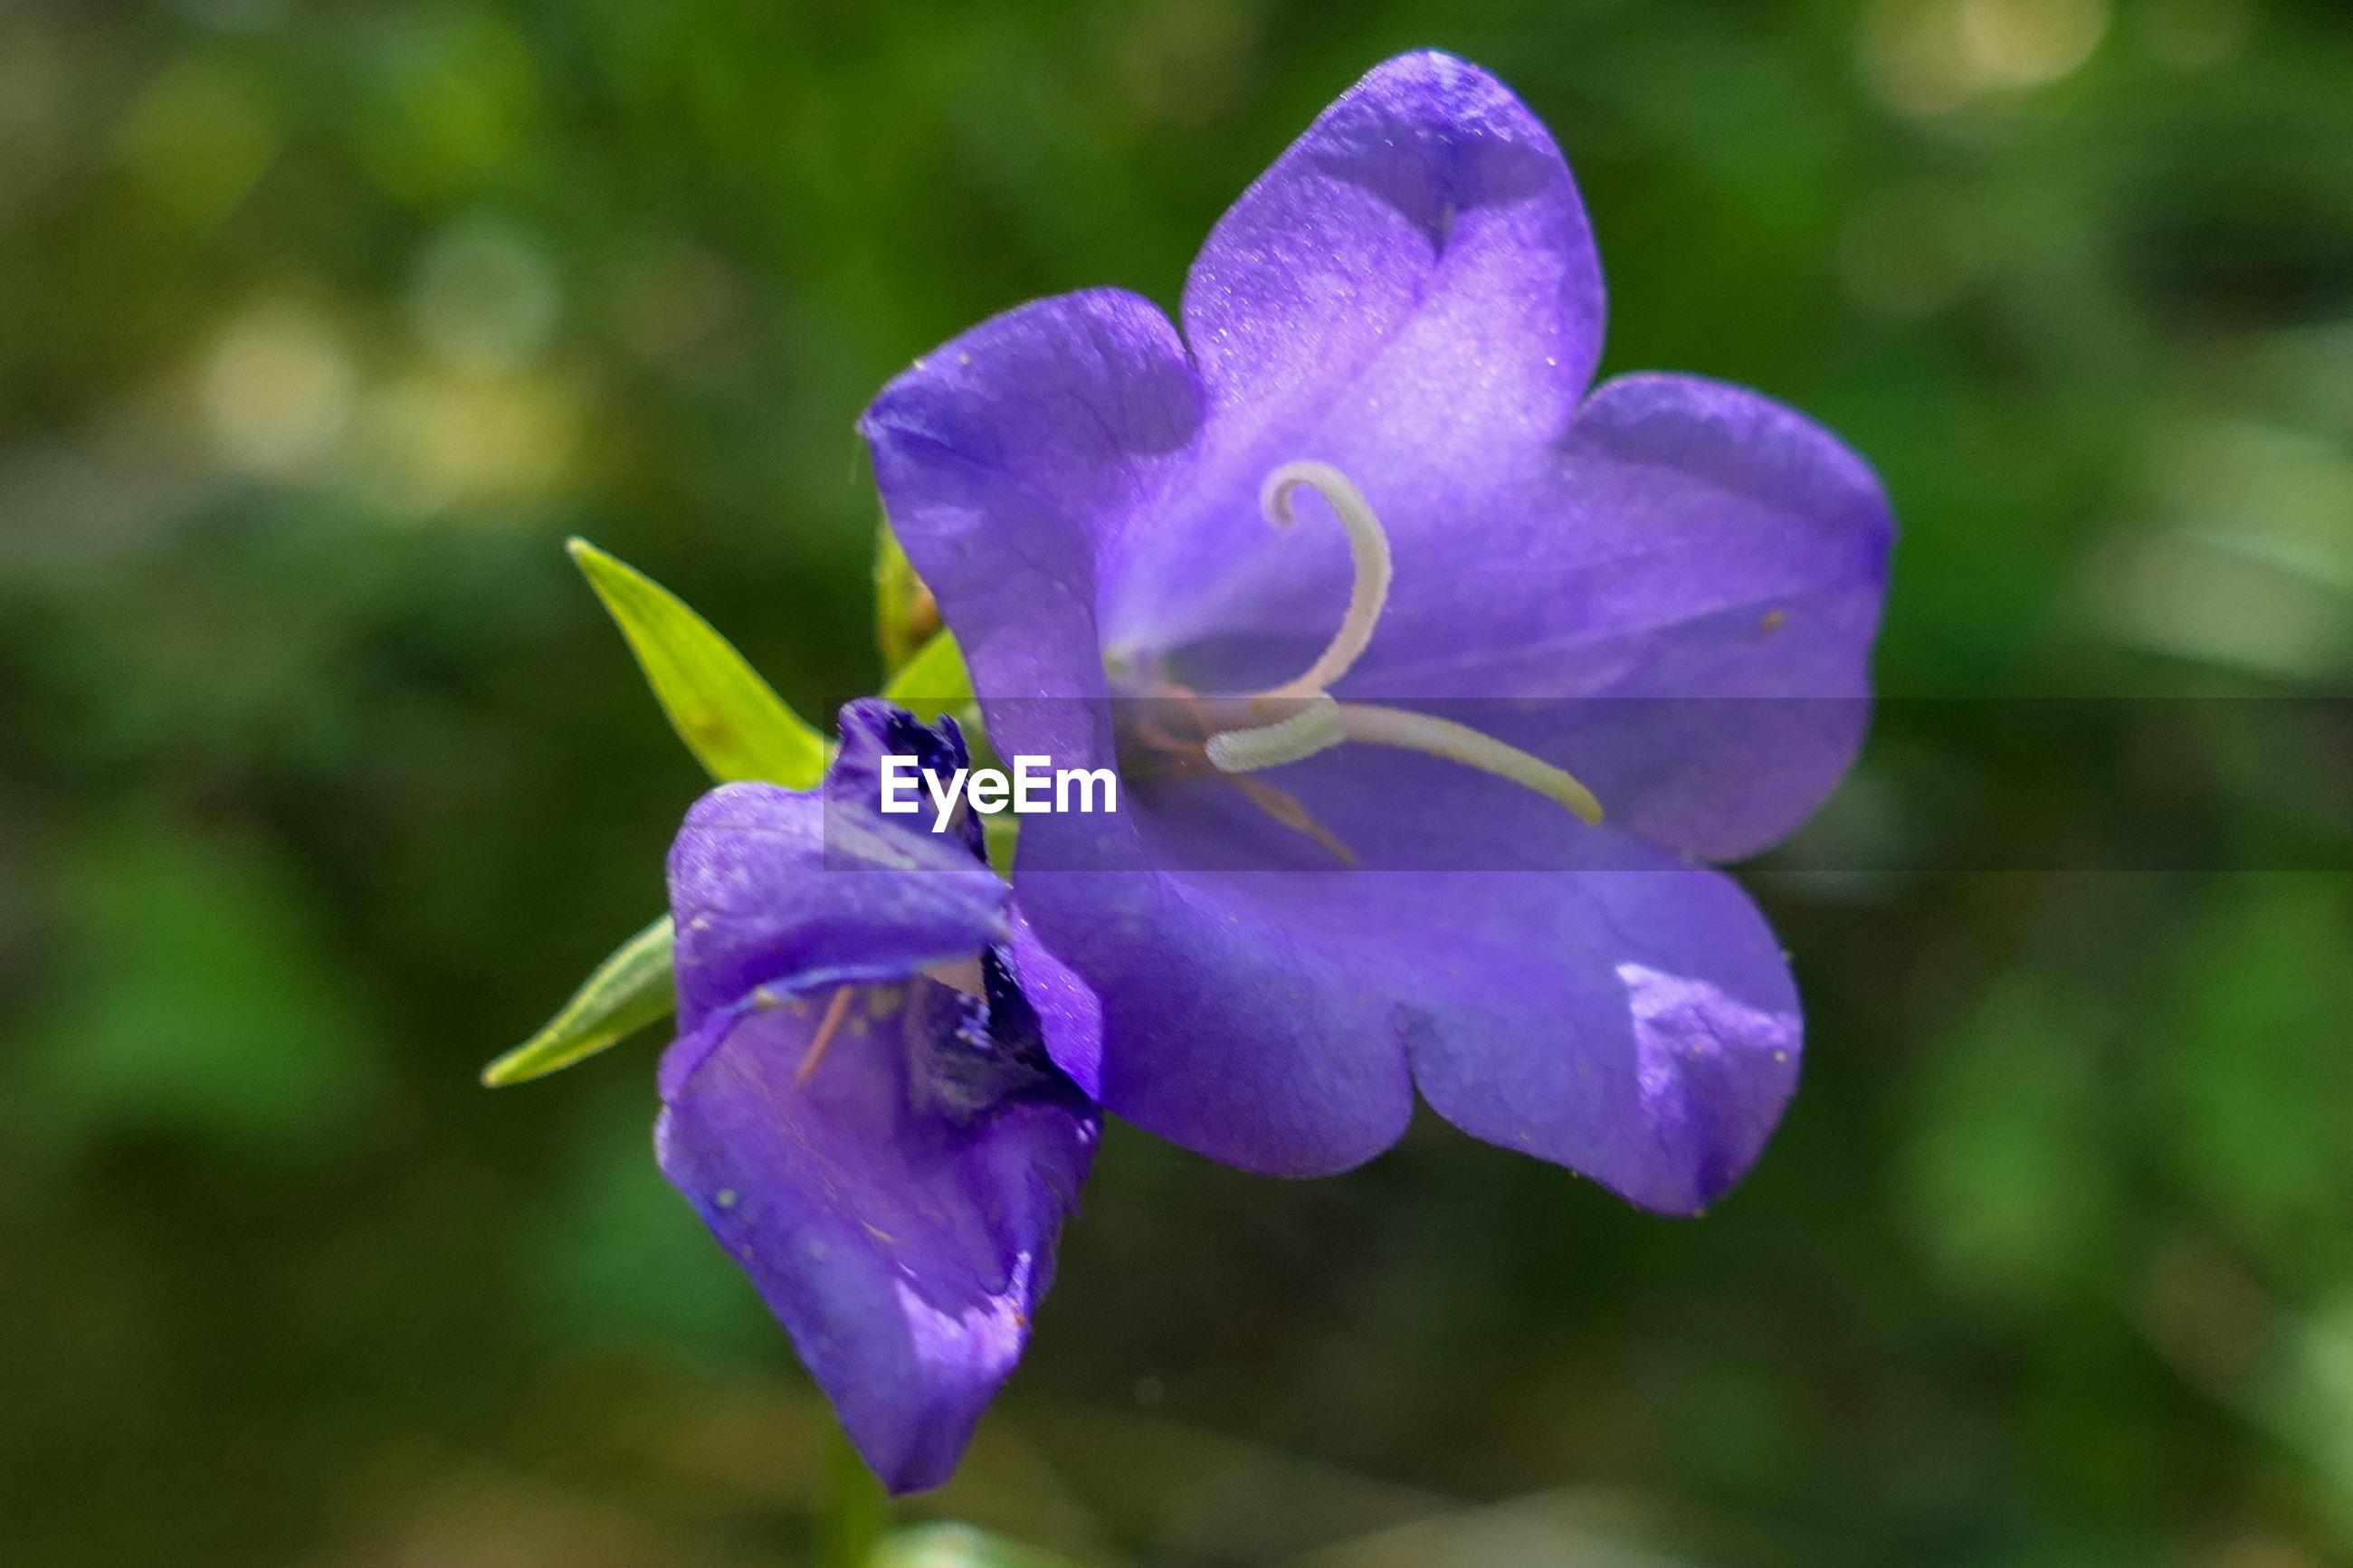 CLOSE-UP OF PURPLE IRIS FLOWER ON PLANT